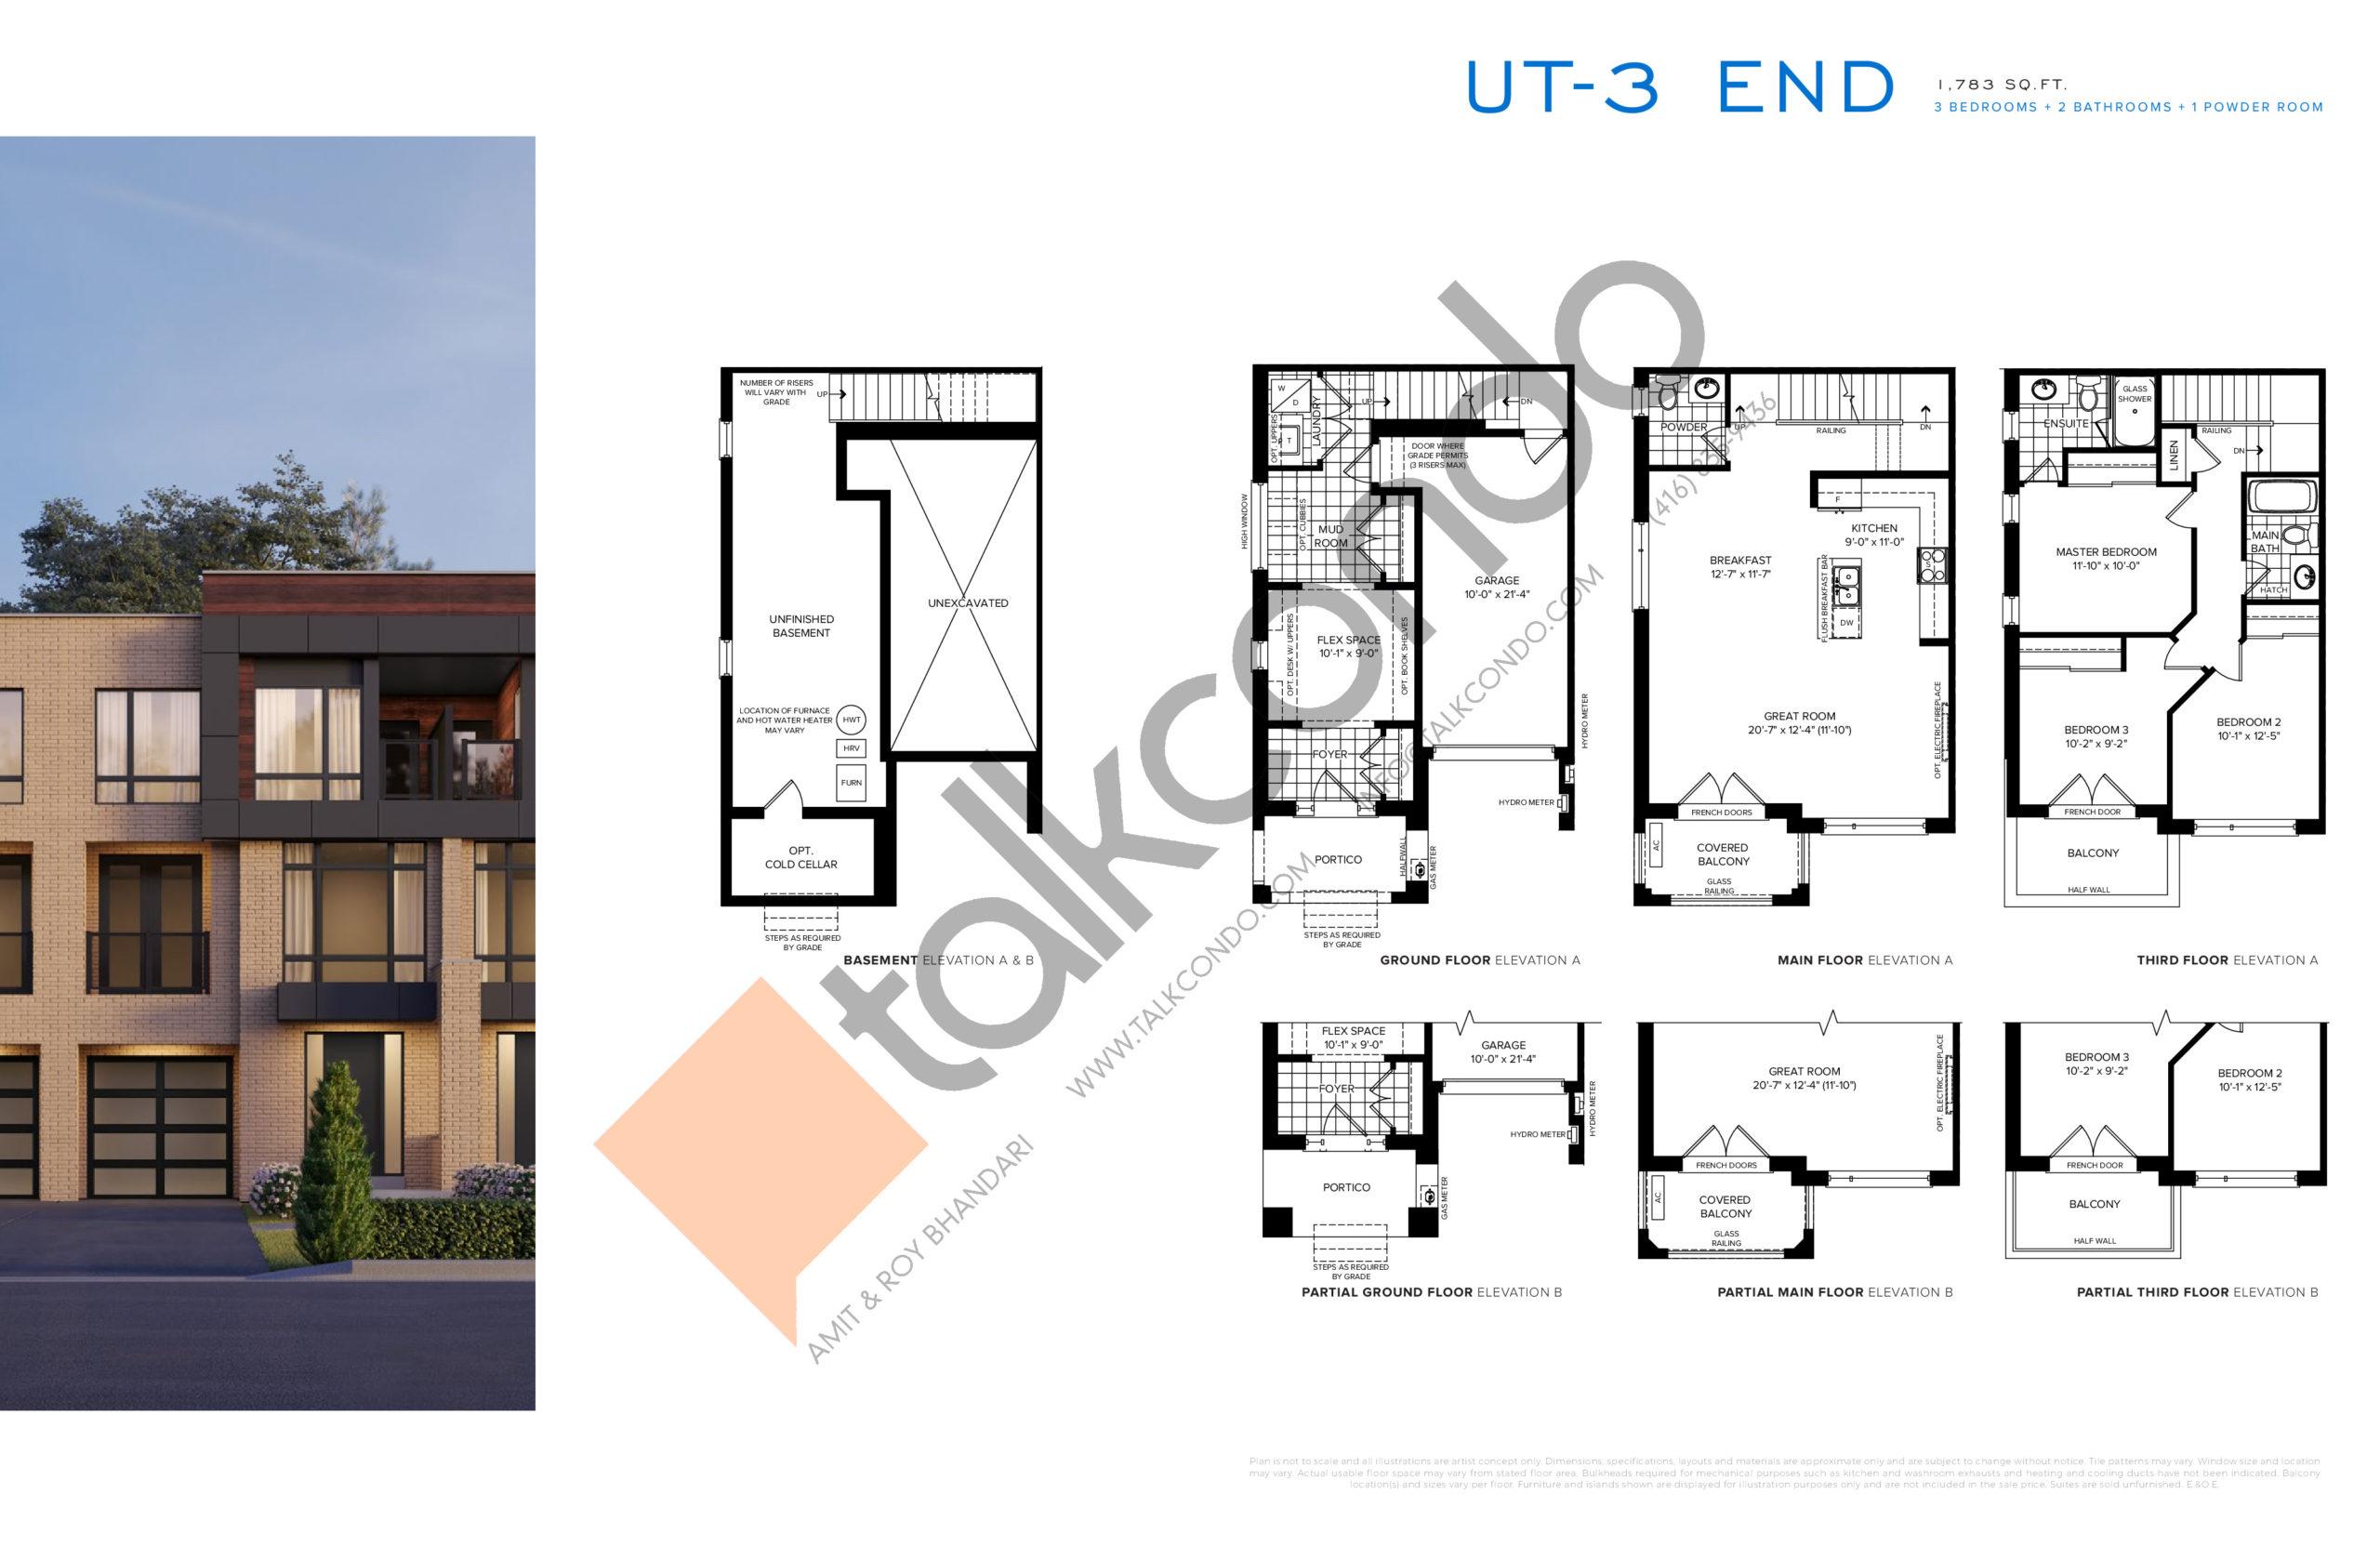 UT-3 End Floor Plan at SXSW Ravine Towns - 1783 sq.ft